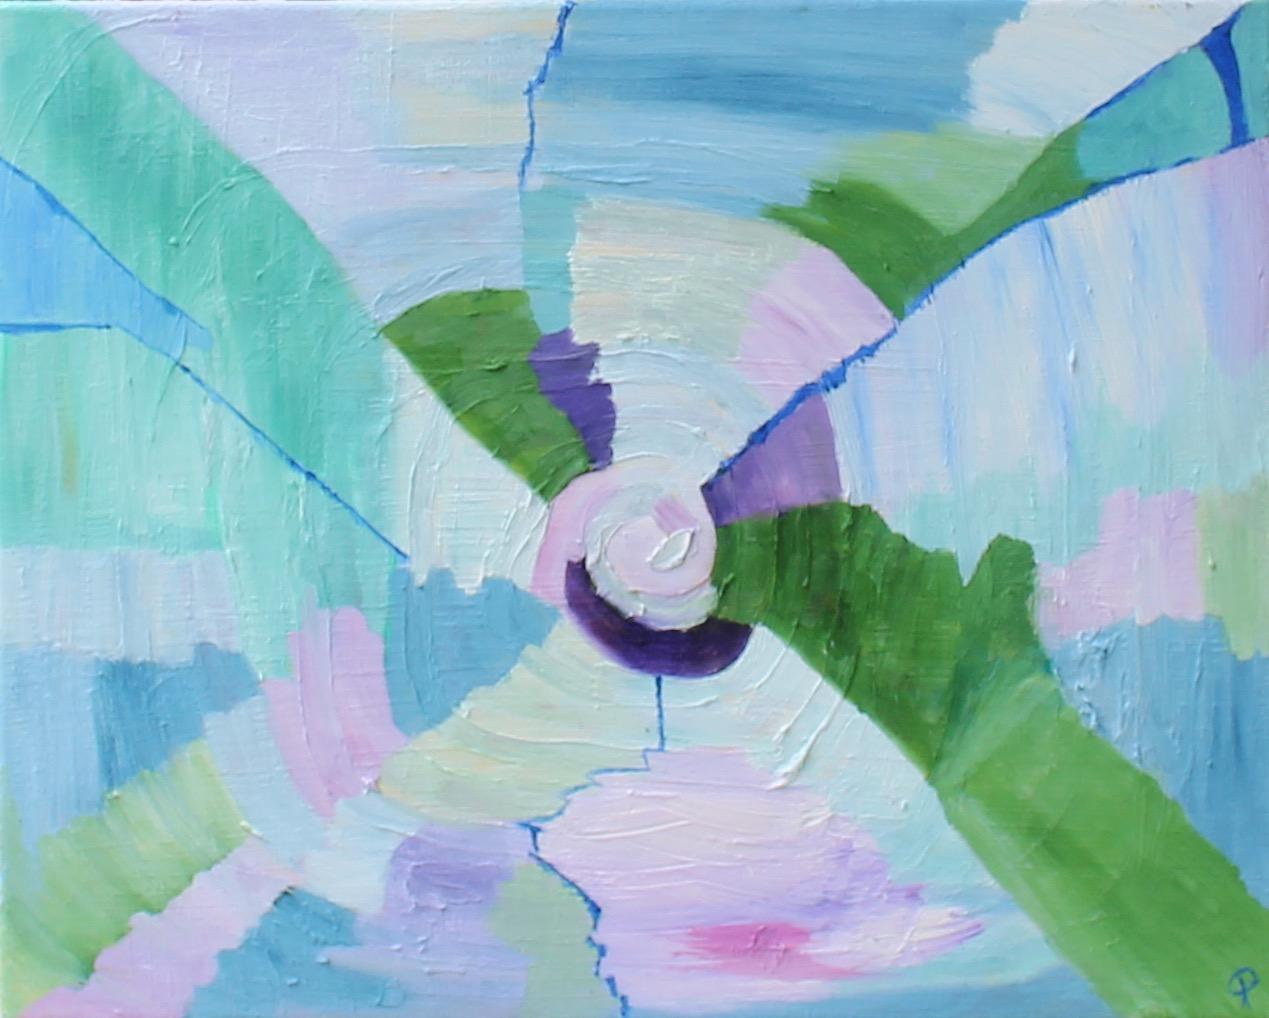 Eddy, Russell Steven Powell oil on canvas, 20x16